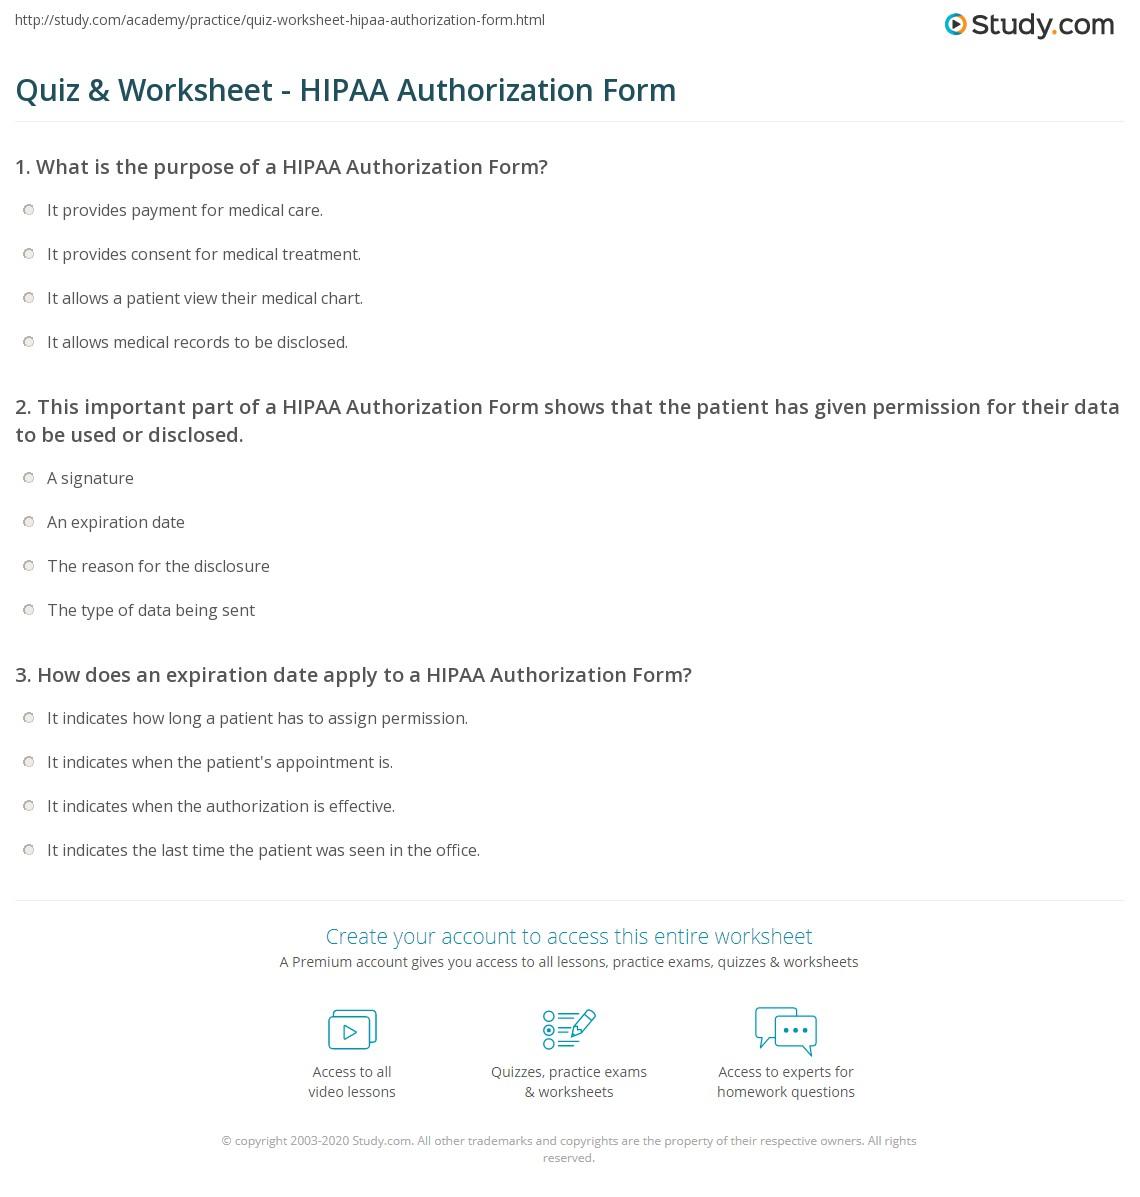 Hipaa Authorization Form | Quiz Worksheet Hipaa Authorization Form Study Com